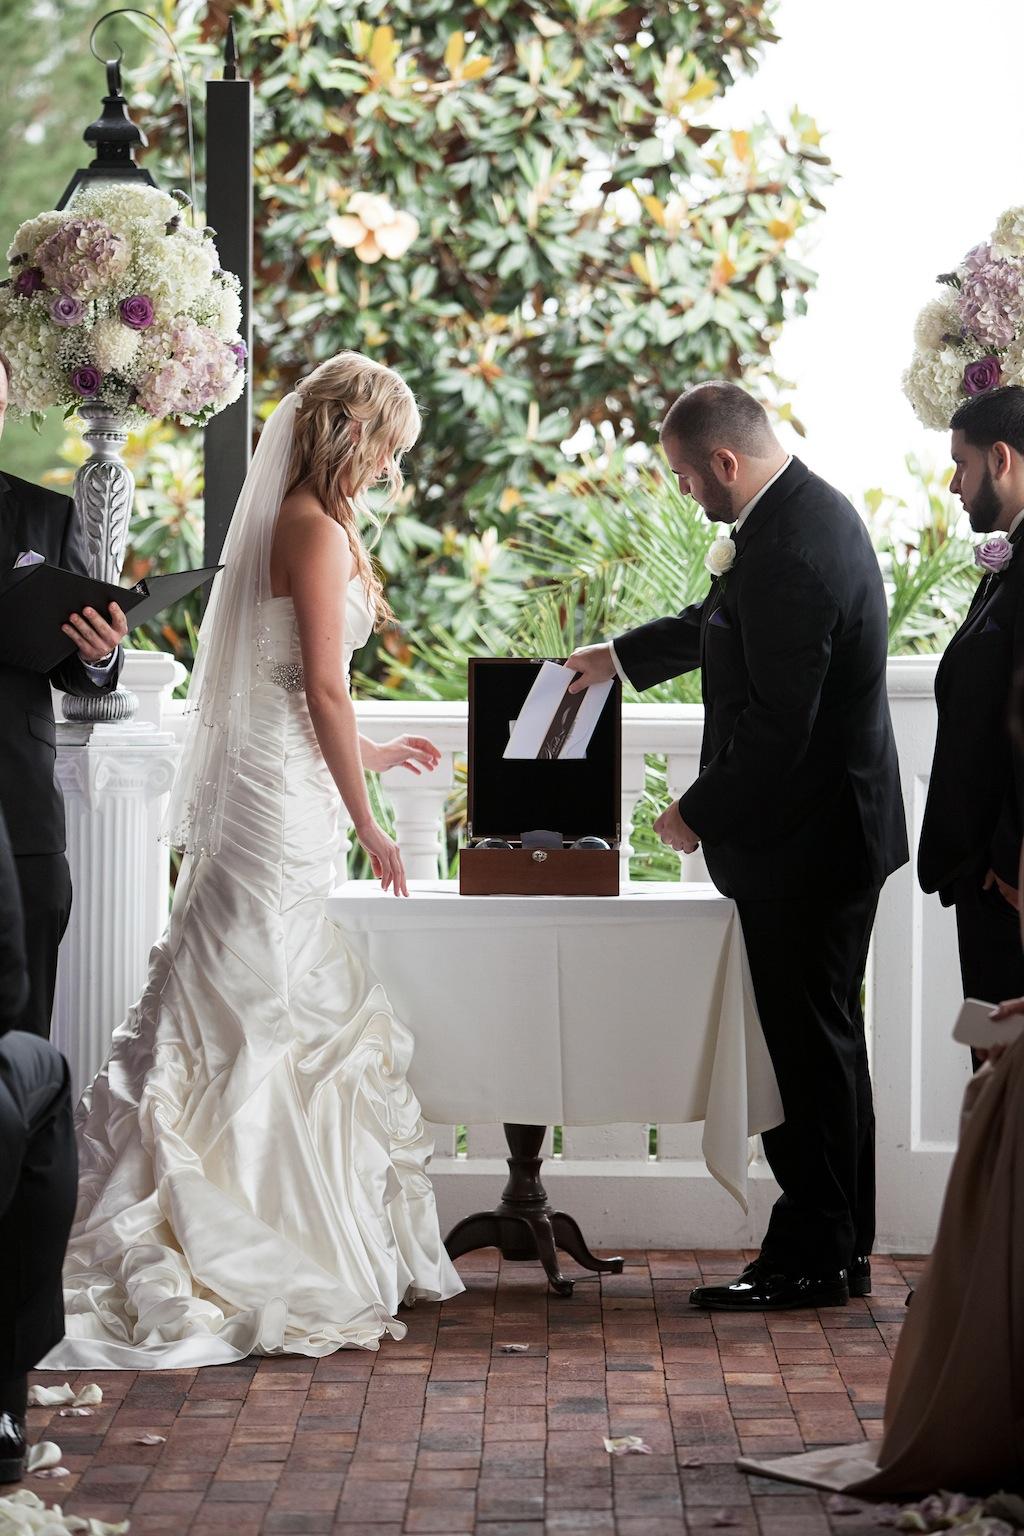 Brooksville Wedding - Purple, Silver & Ivory Wedding at Southern Hills Plantation Club - Brooksville Wedding Photographer Blue Lane Studios (36)